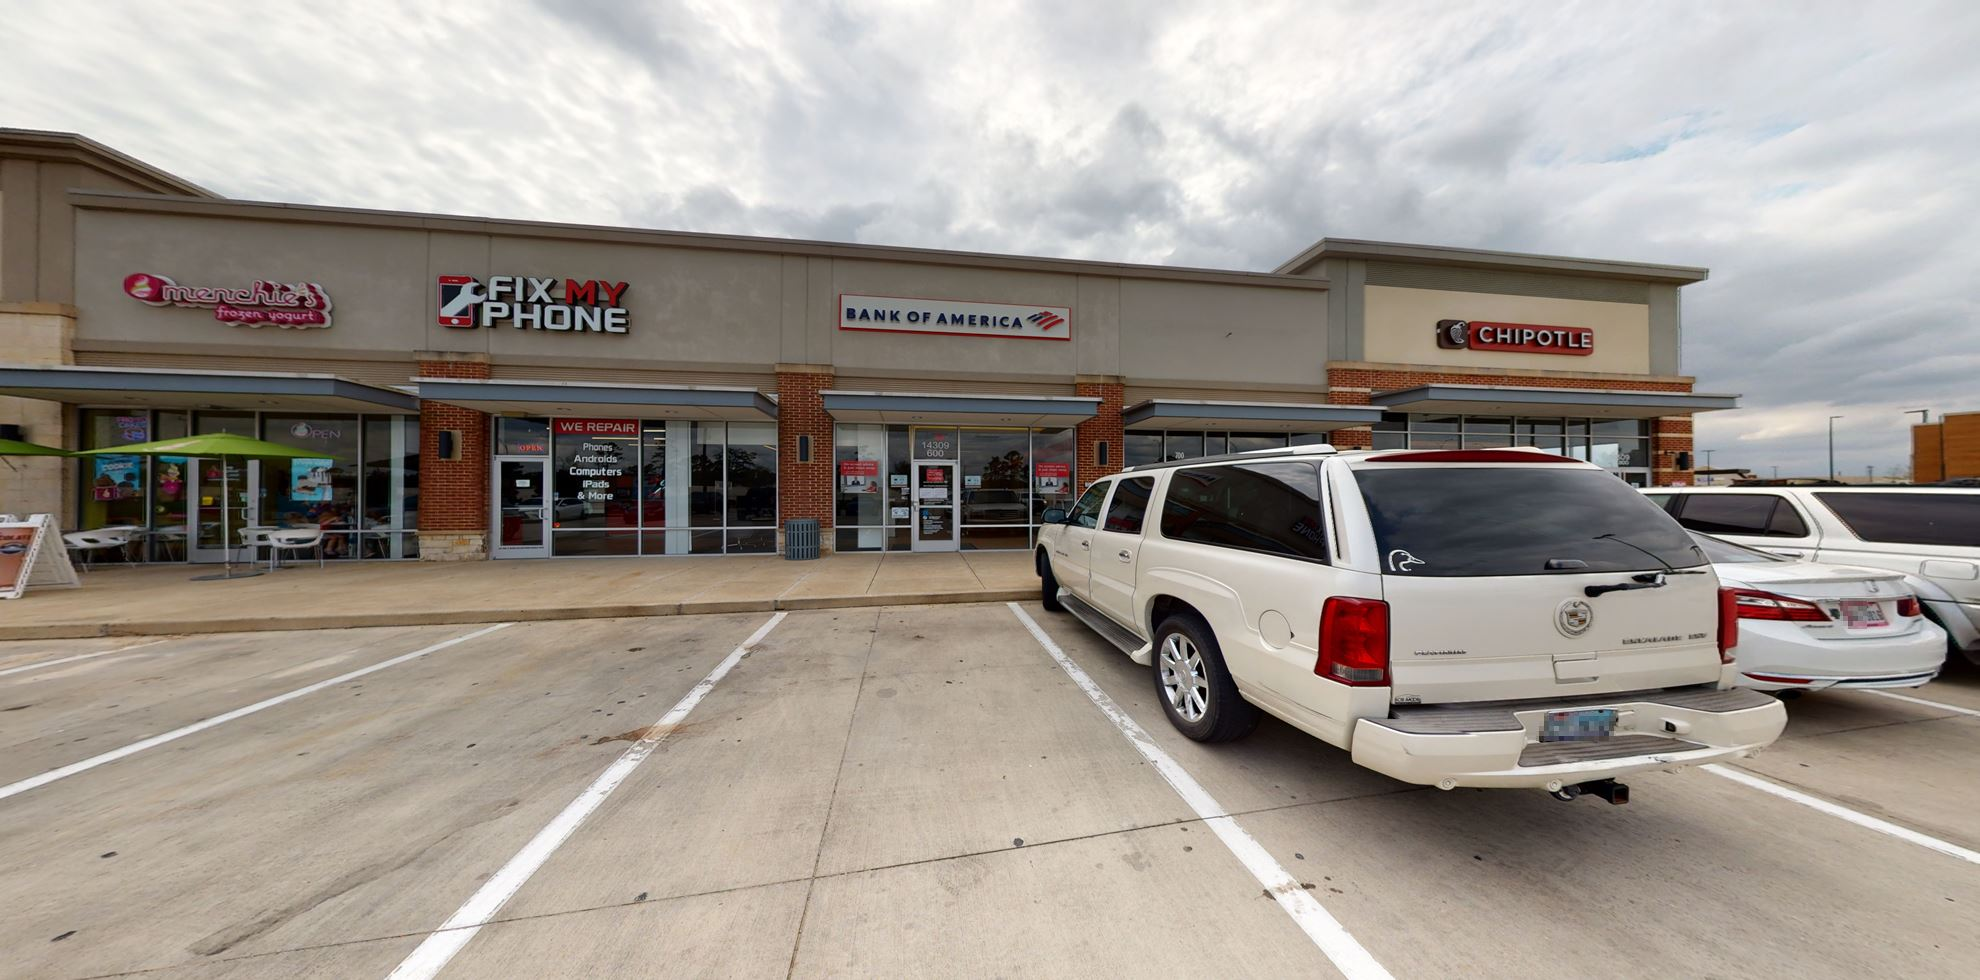 Bank of America Advanced Center with walk-up ATM   14309 E Sam Houston Pkwy N, Houston, TX 77044